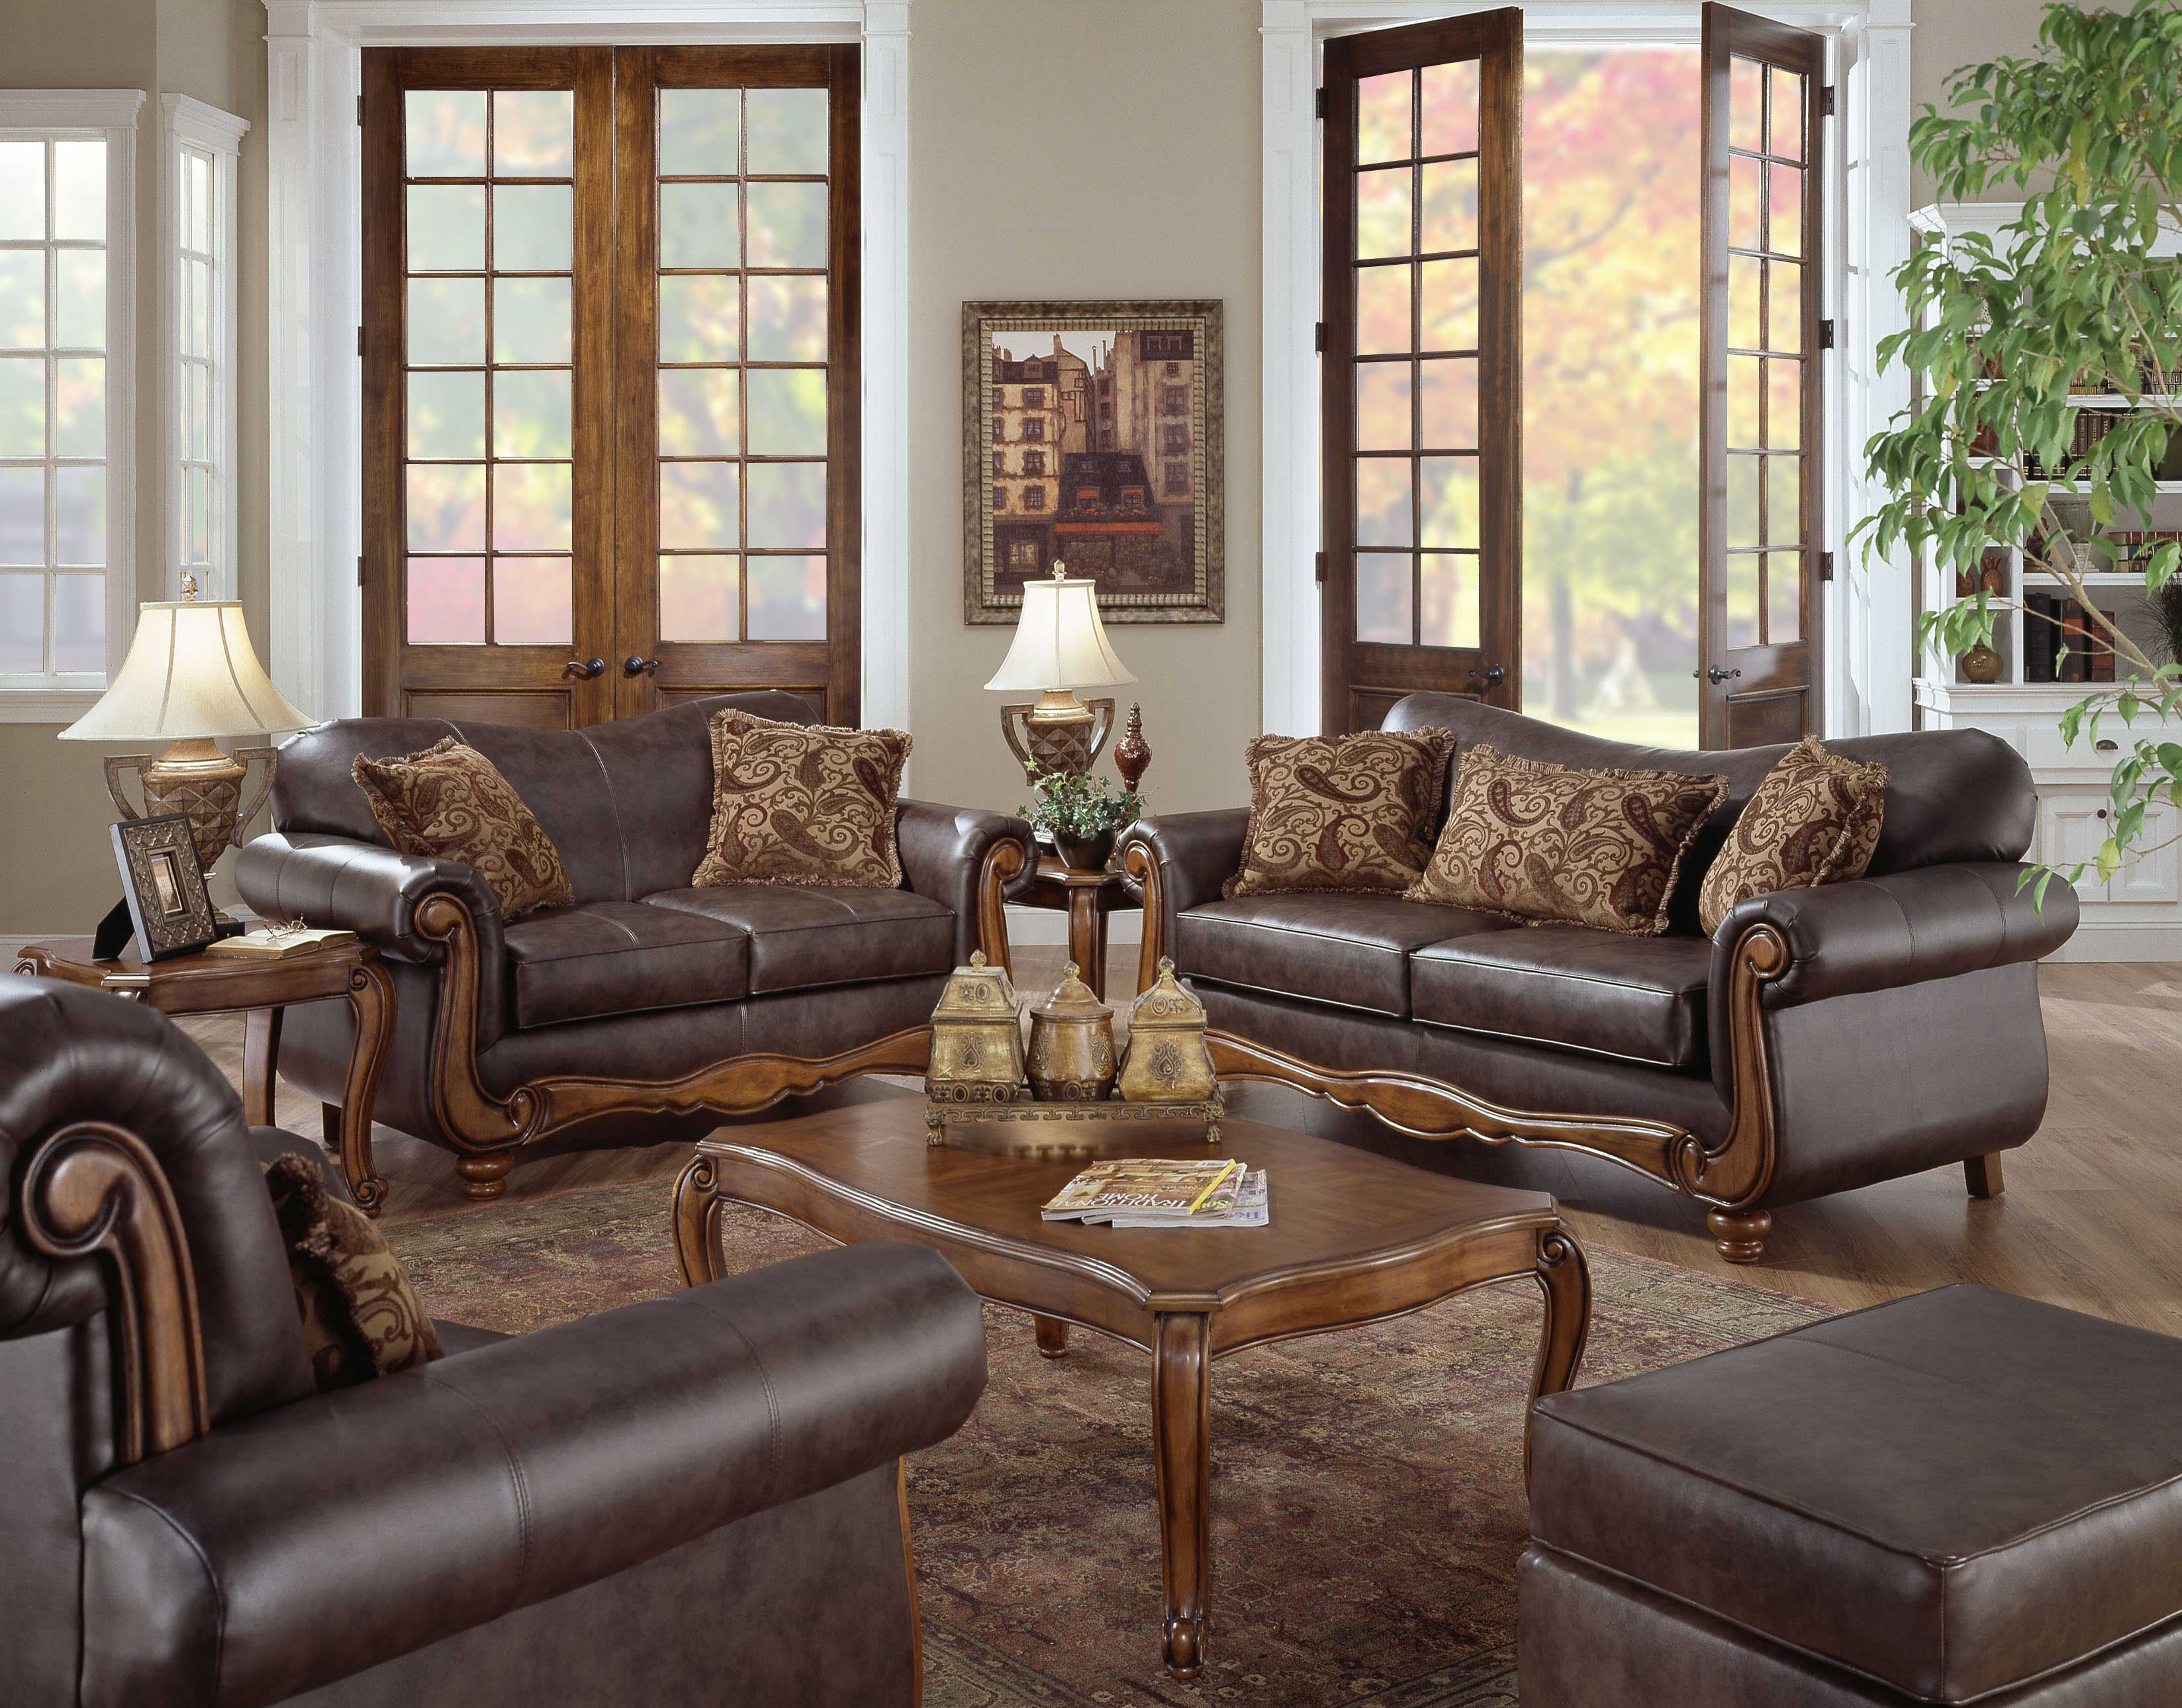 Used Living Room Sets - Decor IdeasDecor Ideas